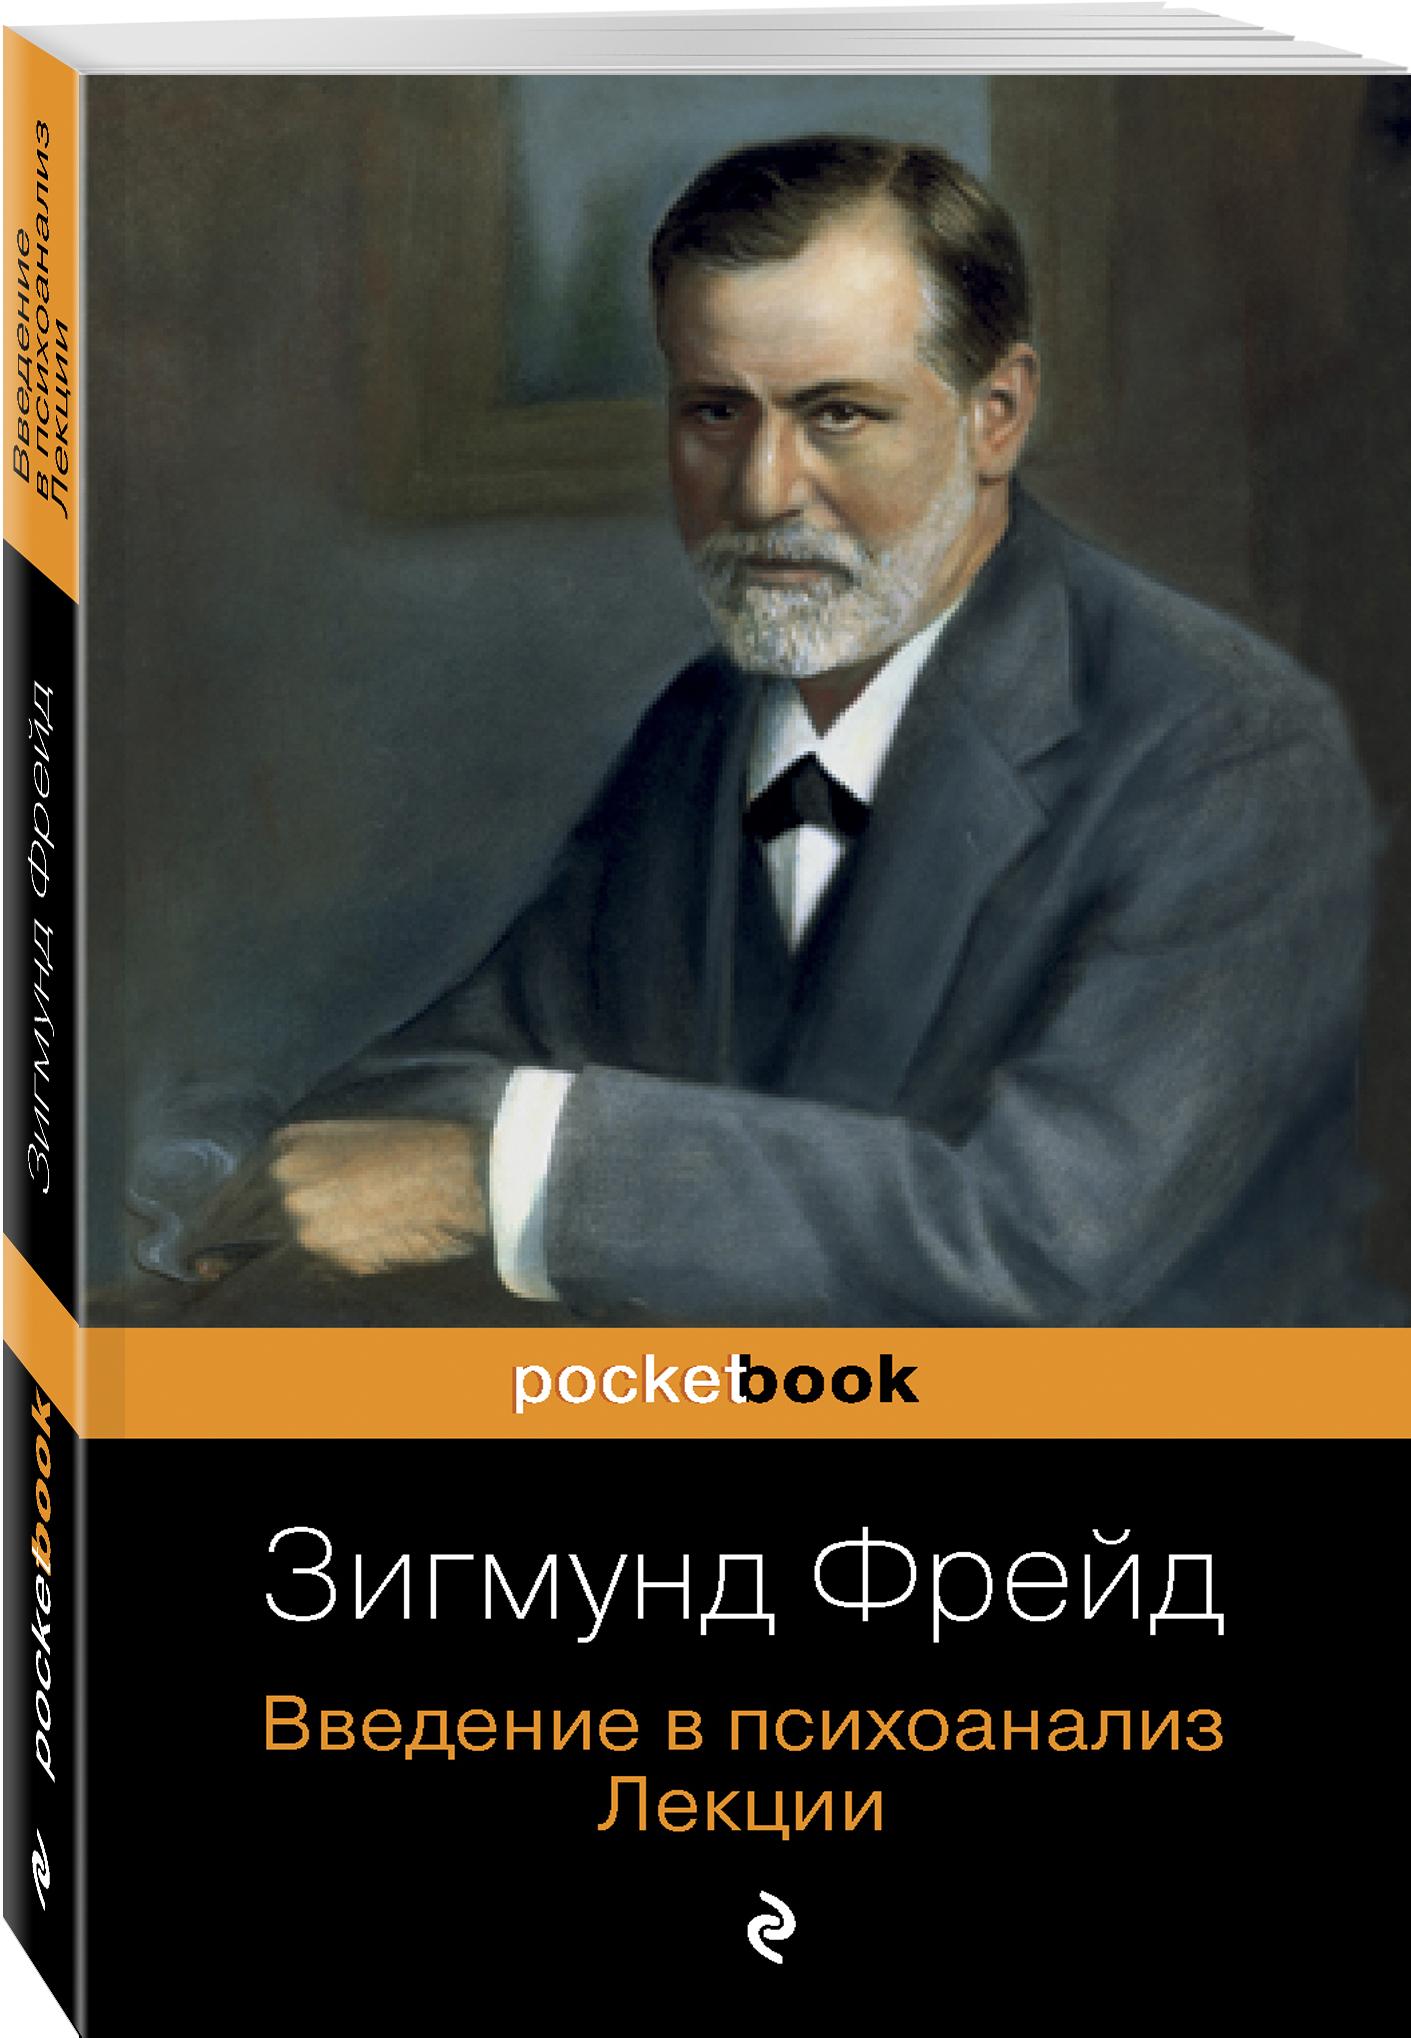 Зигмунд Фрейд Введение в психоанализ. Лекции